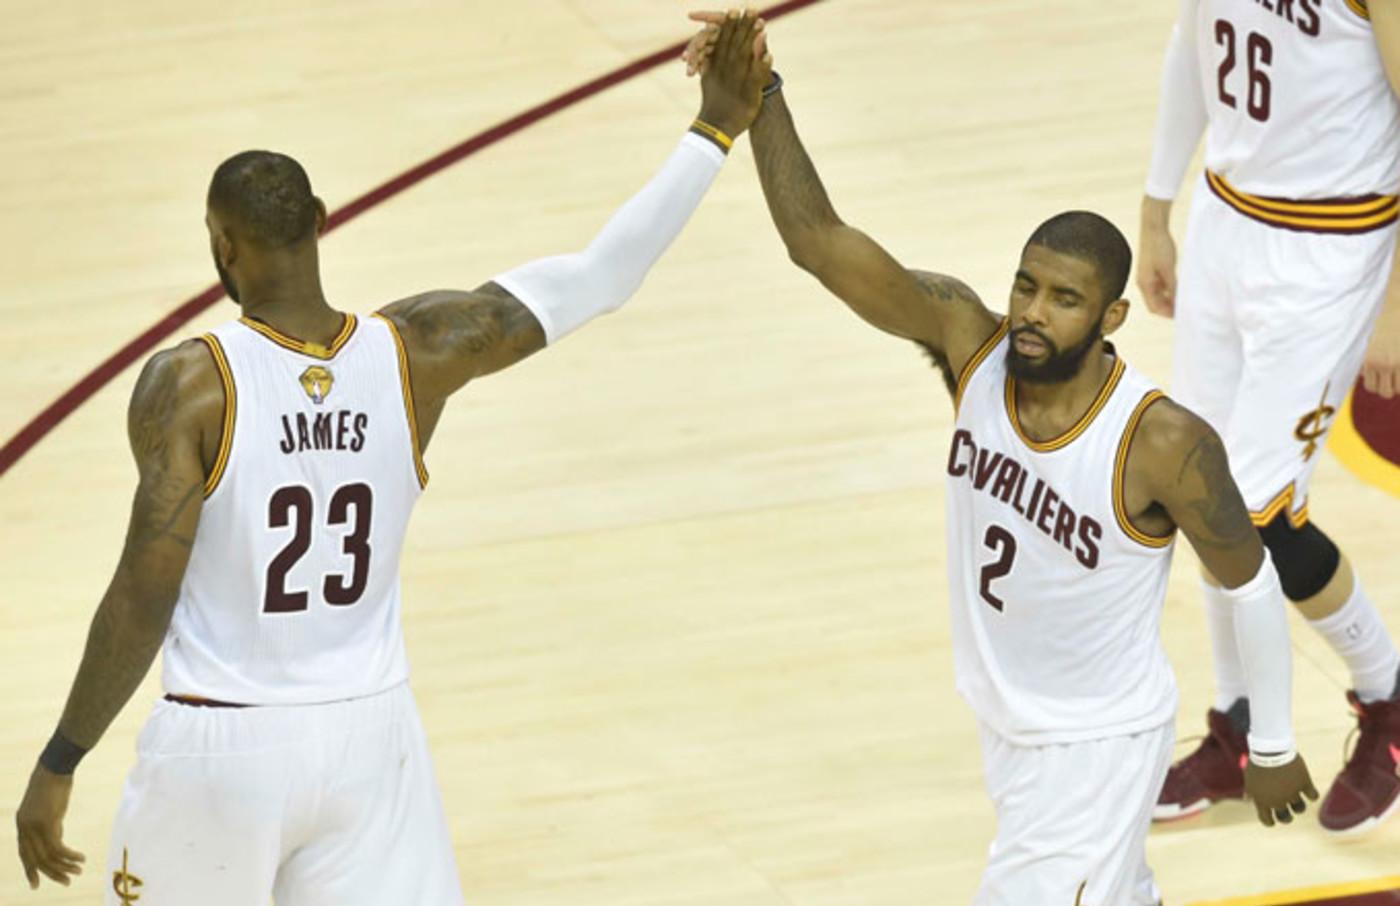 LeBron James high fives Kyrie Irving.